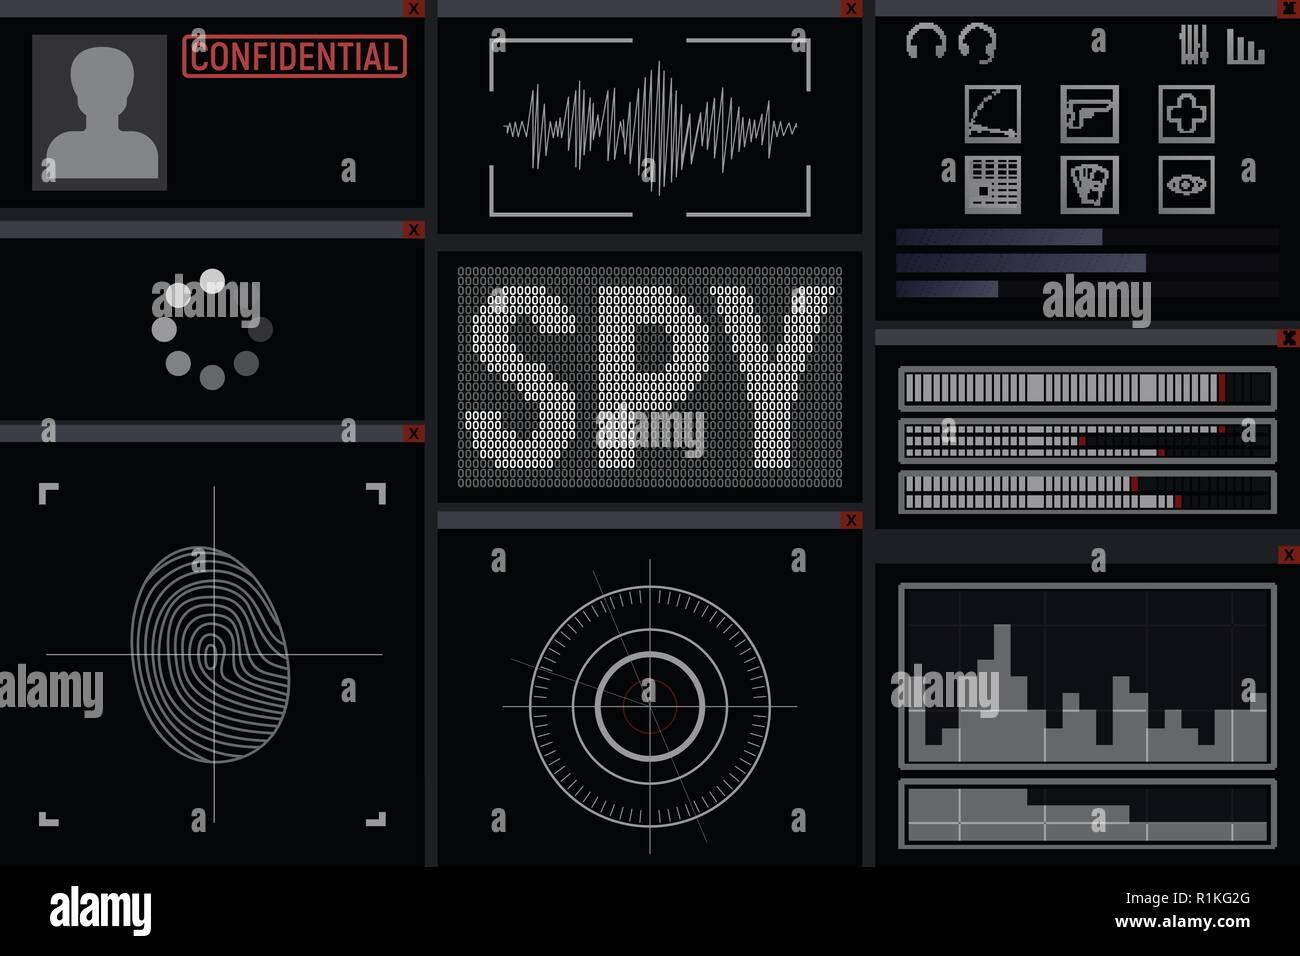 Program for the spy. Display vector illustration. hacker - Stock Vector